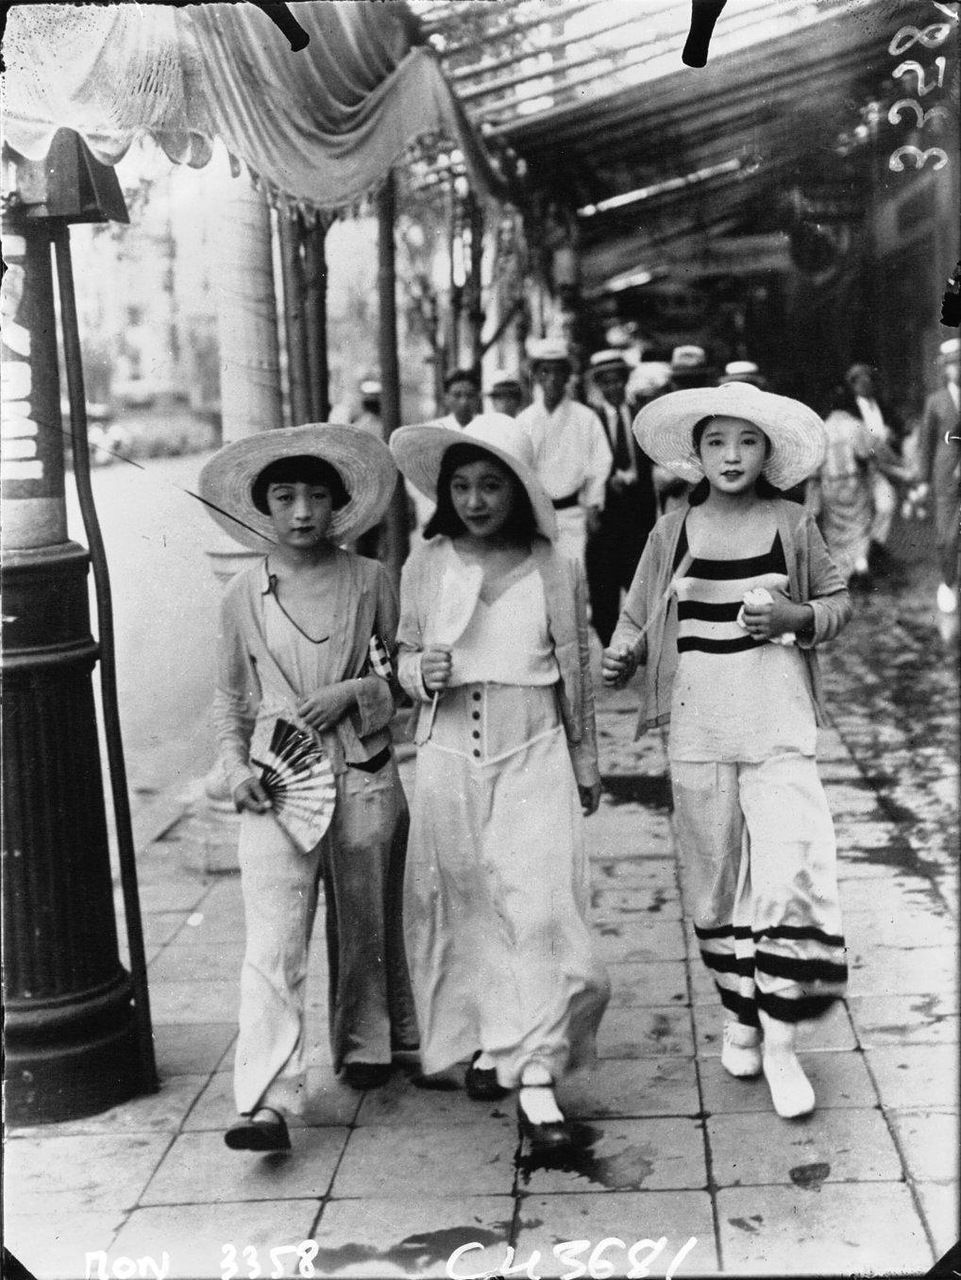 Street Fashion Japan 1932 History Pinterest Japan